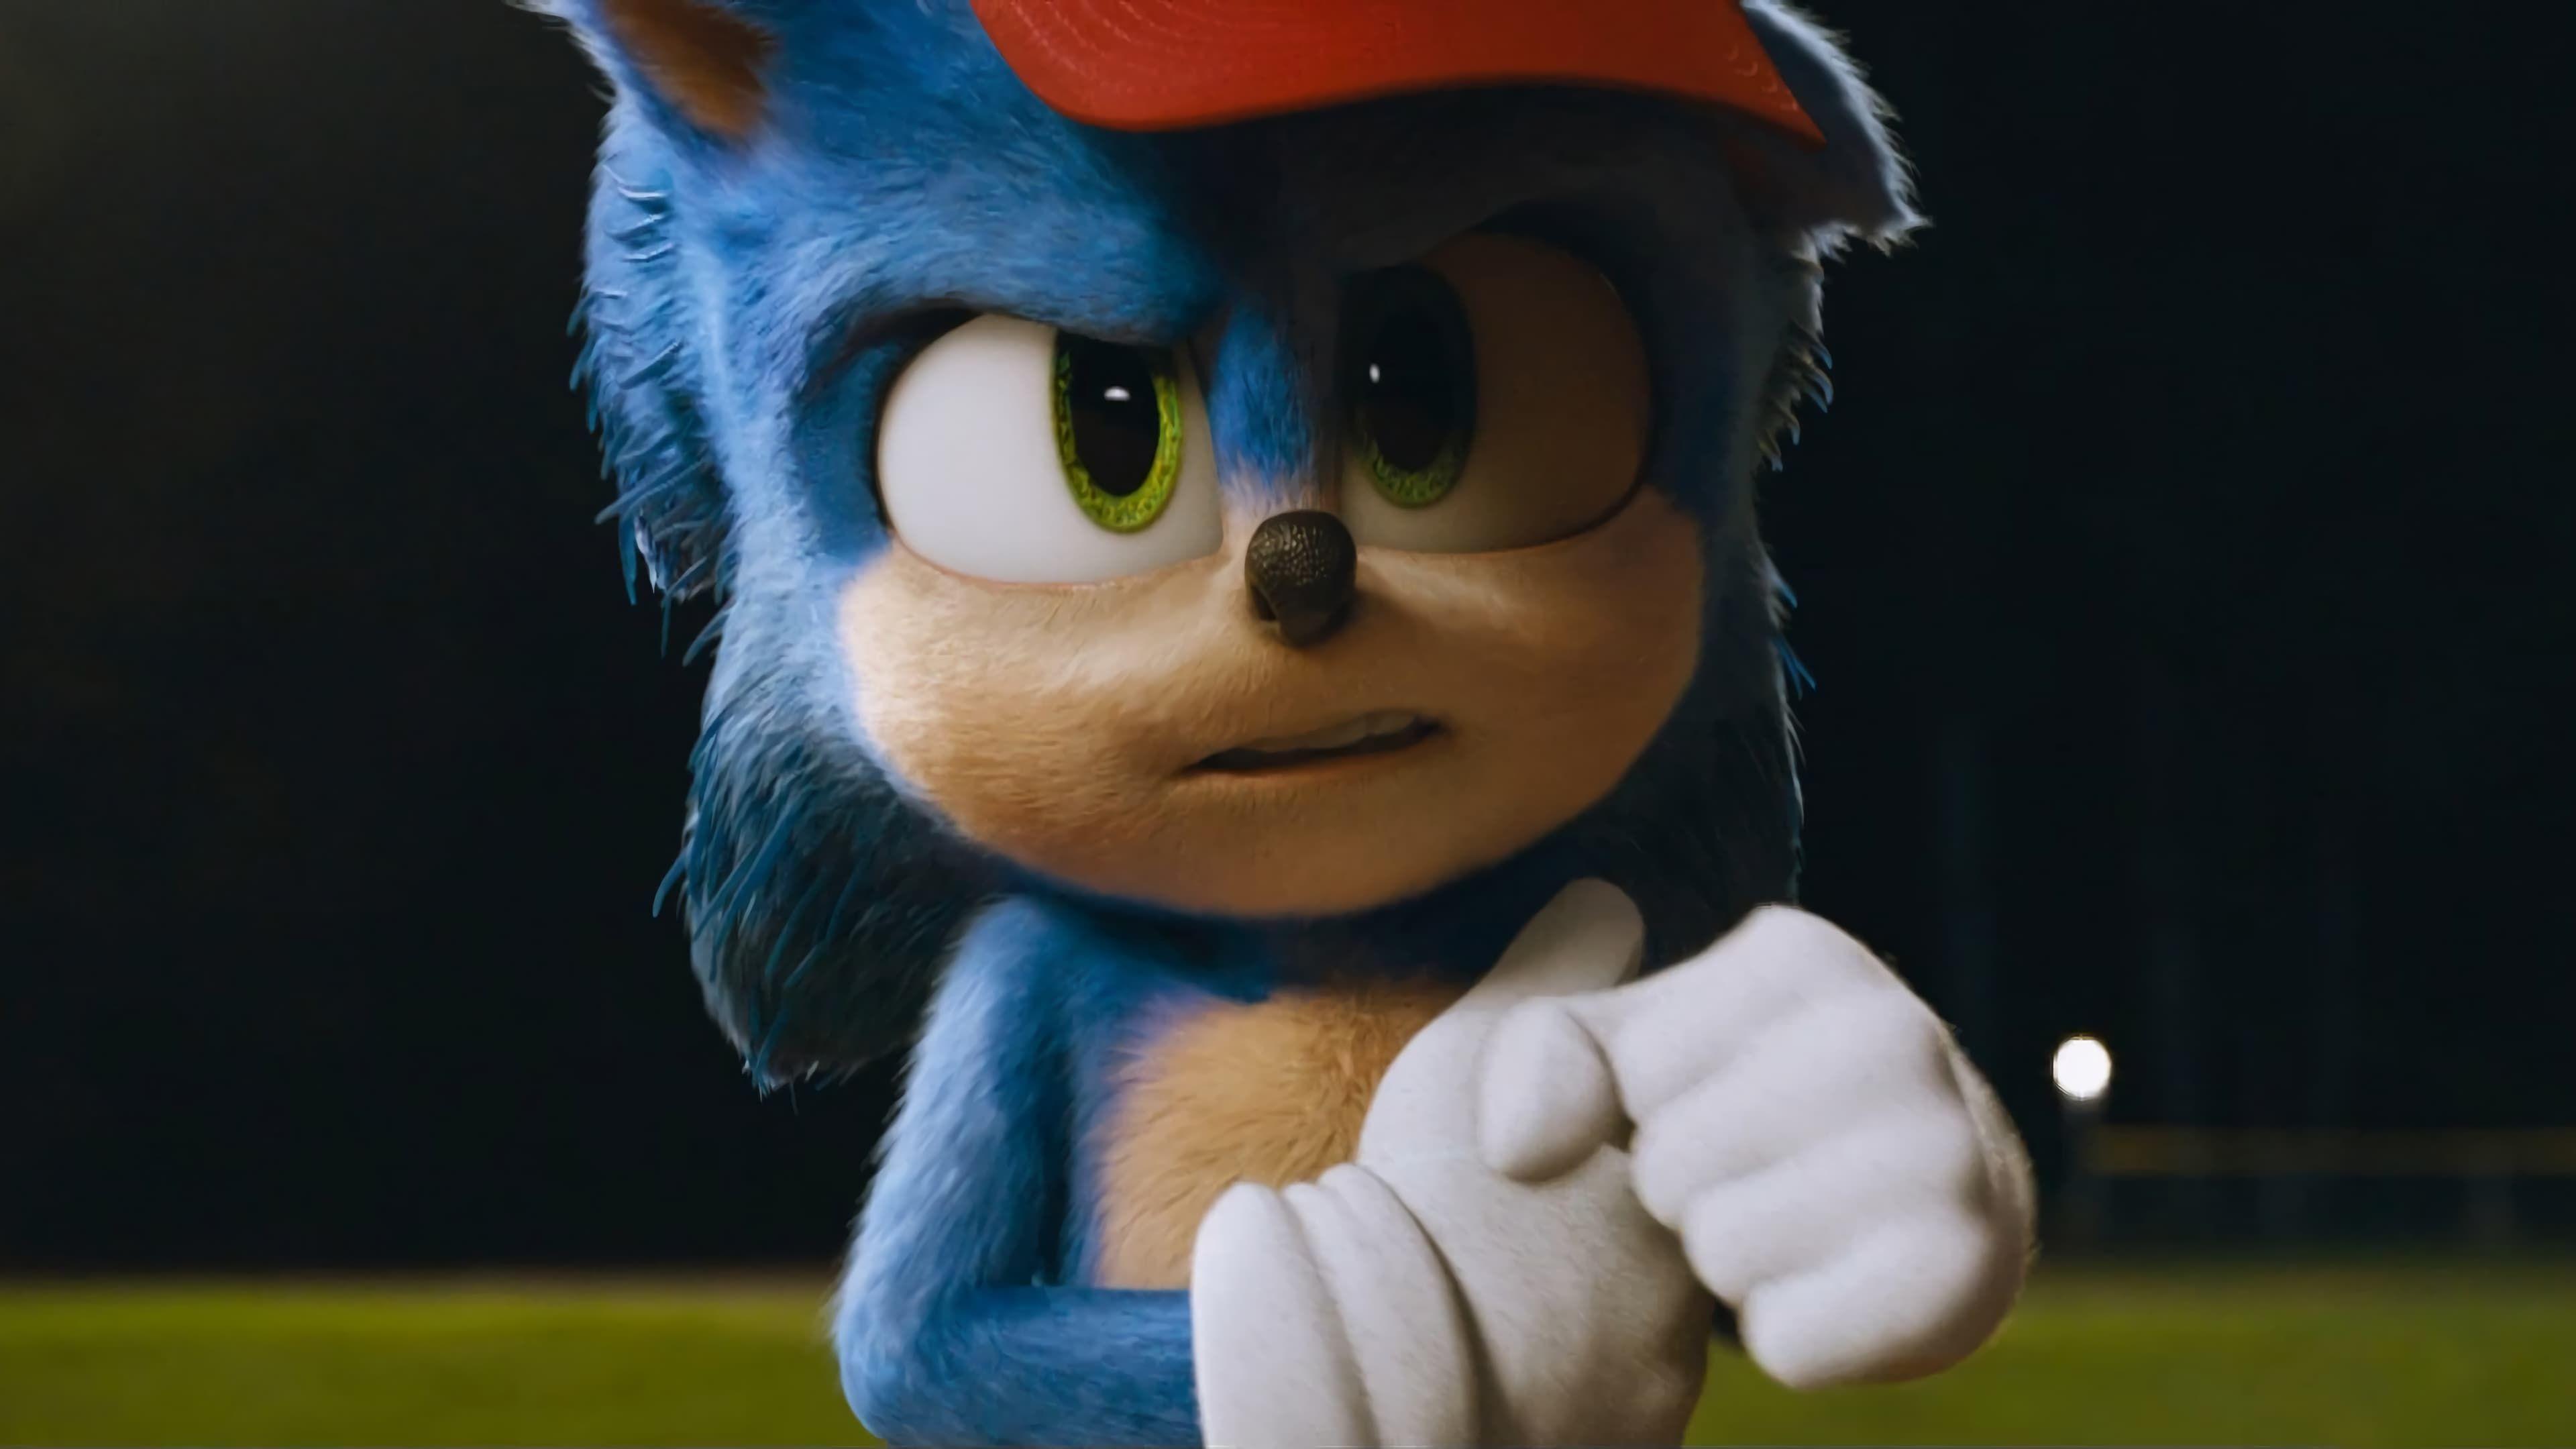 Sonic The Hedgehog 2020 Um Movies Online Free Movies Online Hedgehog Movie